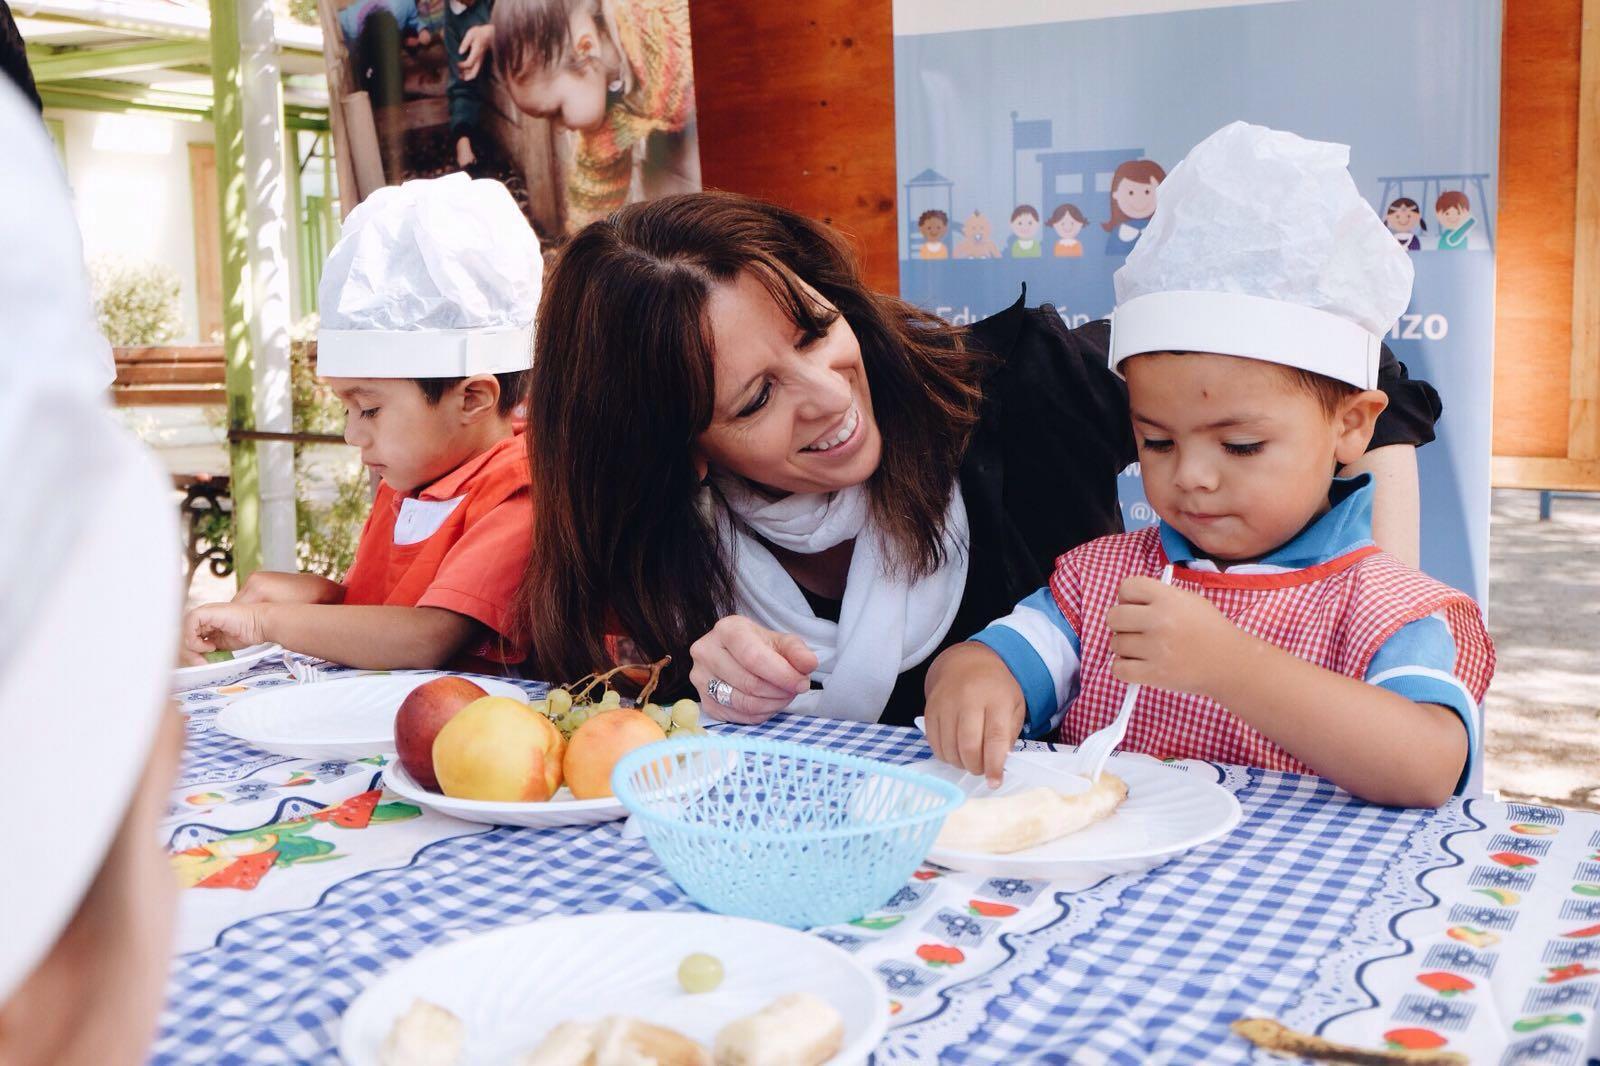 Ministra s de educaci n sobre programa jard n de verano for Postulacion jardin junji 2016